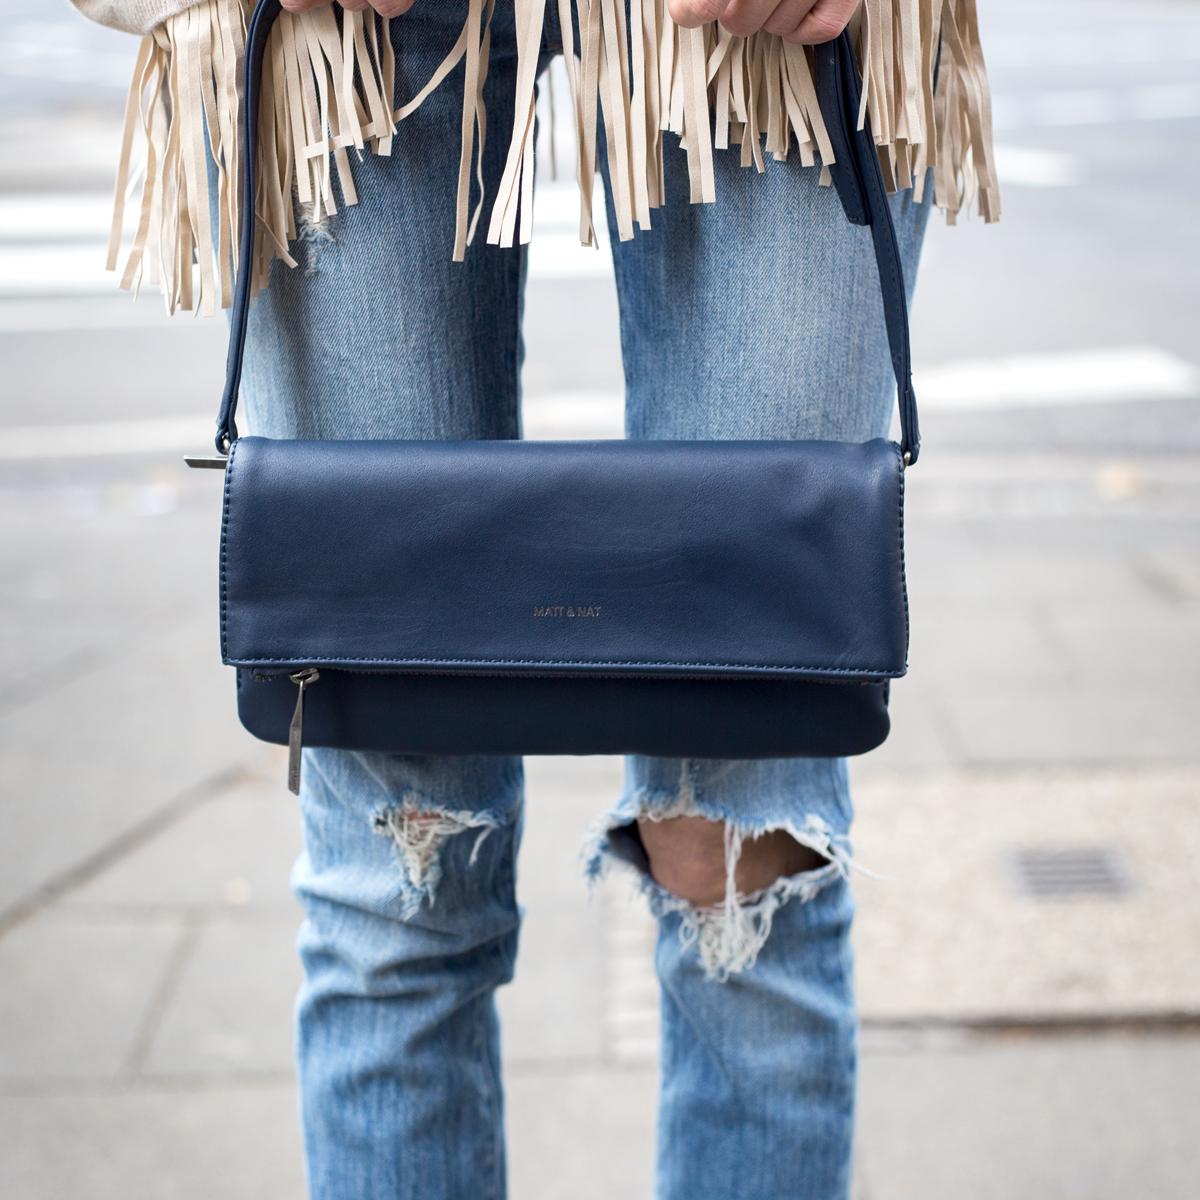 Day 7 | Matt & Nat Bag via Lieblingstasche  | Blogger Adventskalender 2016 | How I met my outfit by Dana Lohmüller